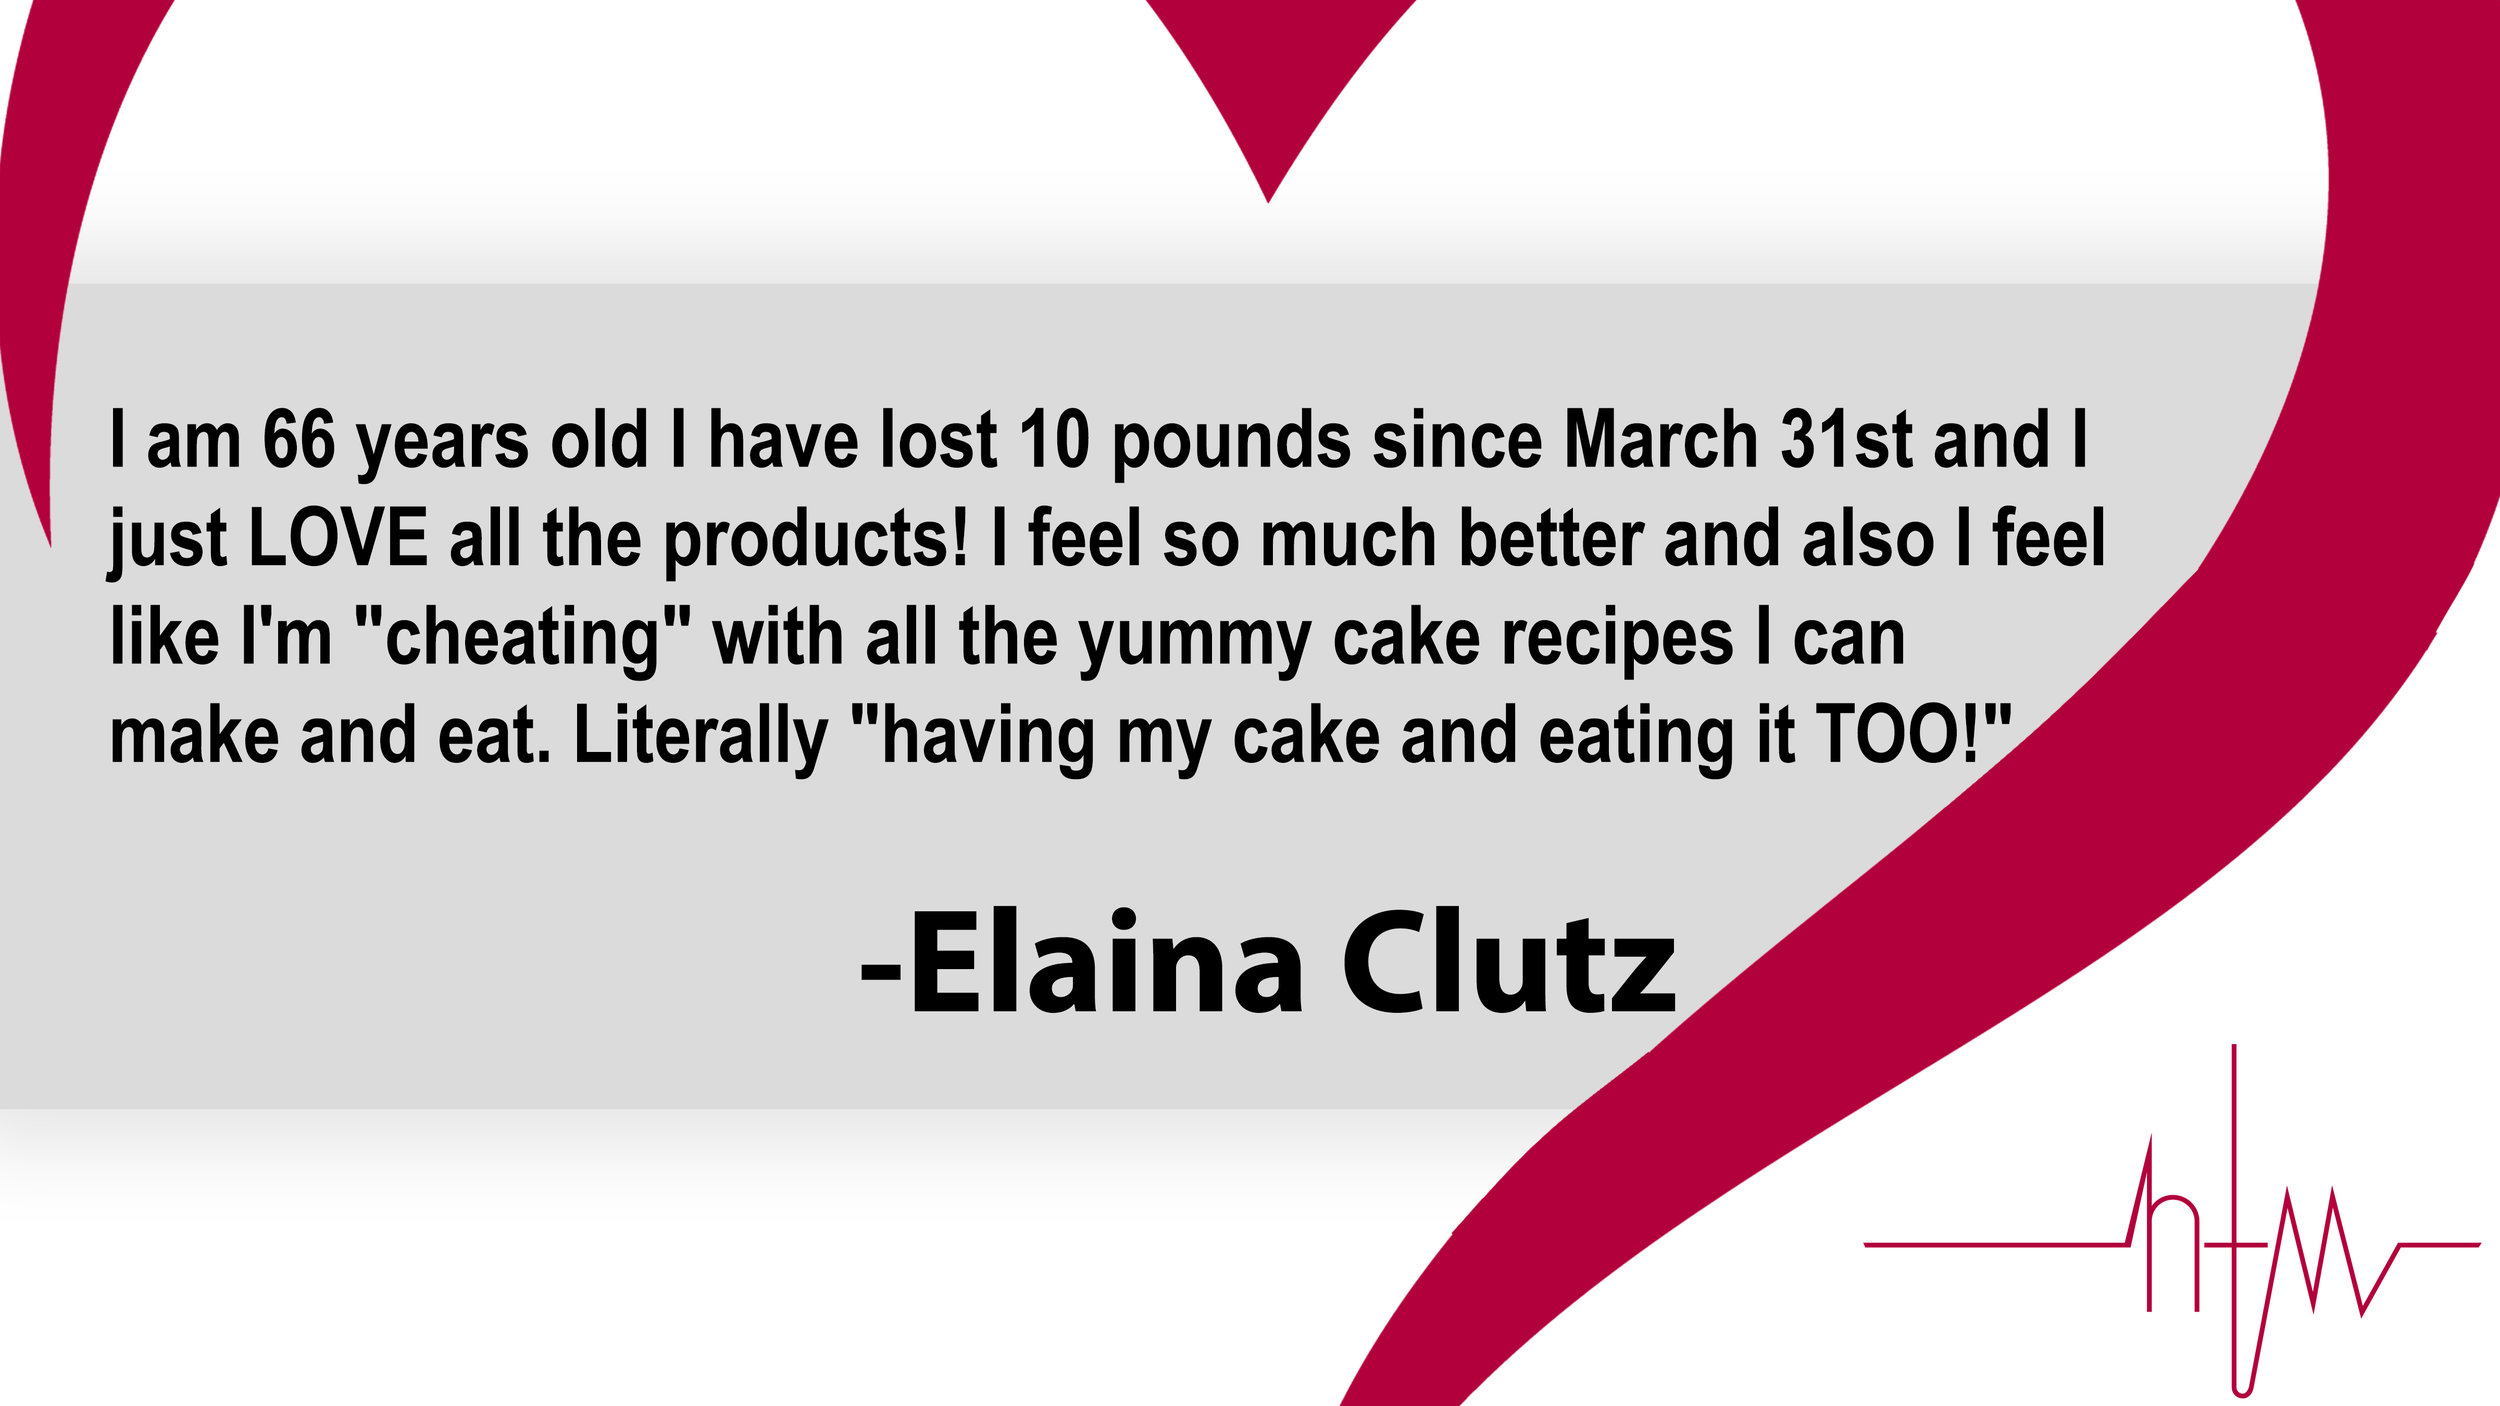 Elaina_Clutz_Testimony.jpg